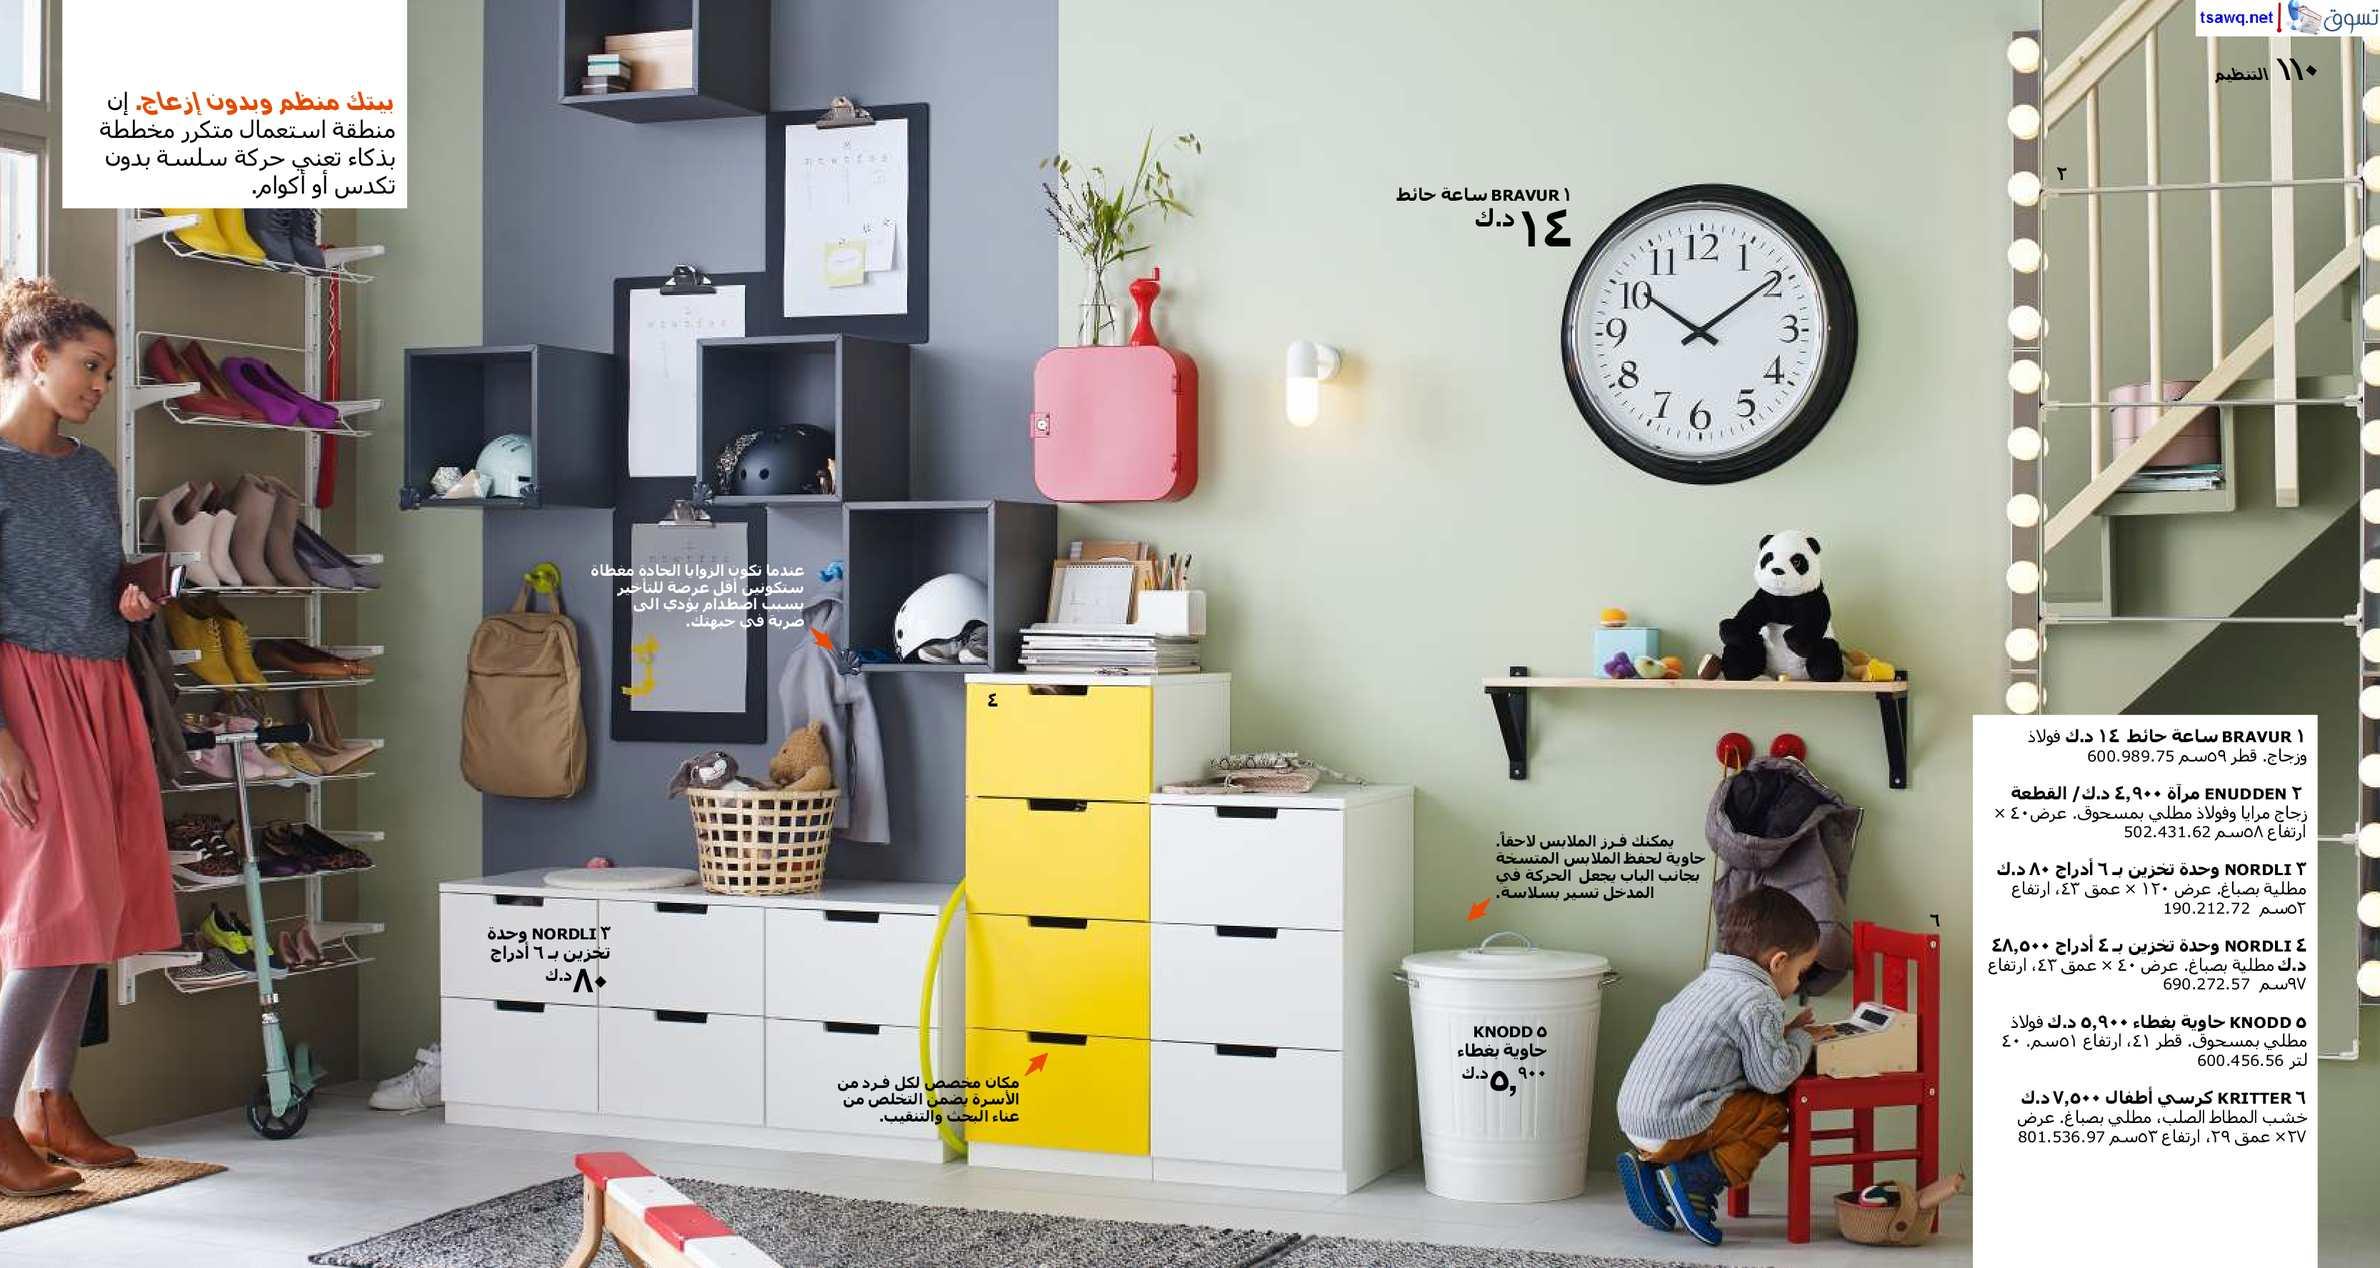 8017e1fcb كتالوج ايكيا الكويت 2016 - IKEA مع نسخة pdf الأشياء الصغيرة تعني الكثير